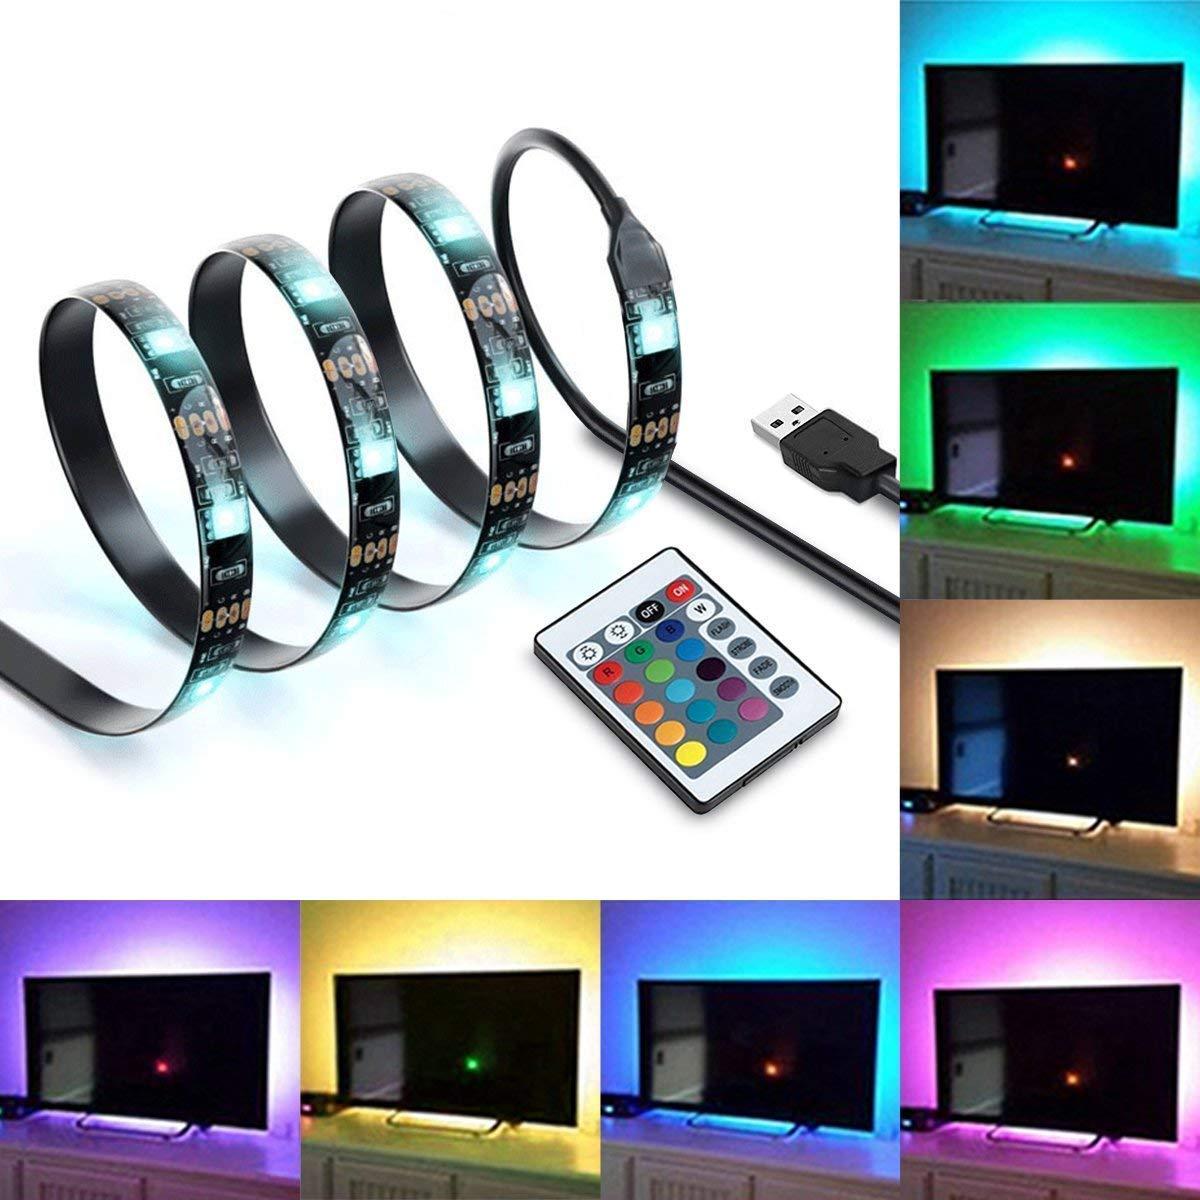 IREGRO 200cm TV LED Posteriore di Illuminazione Kit, Mul